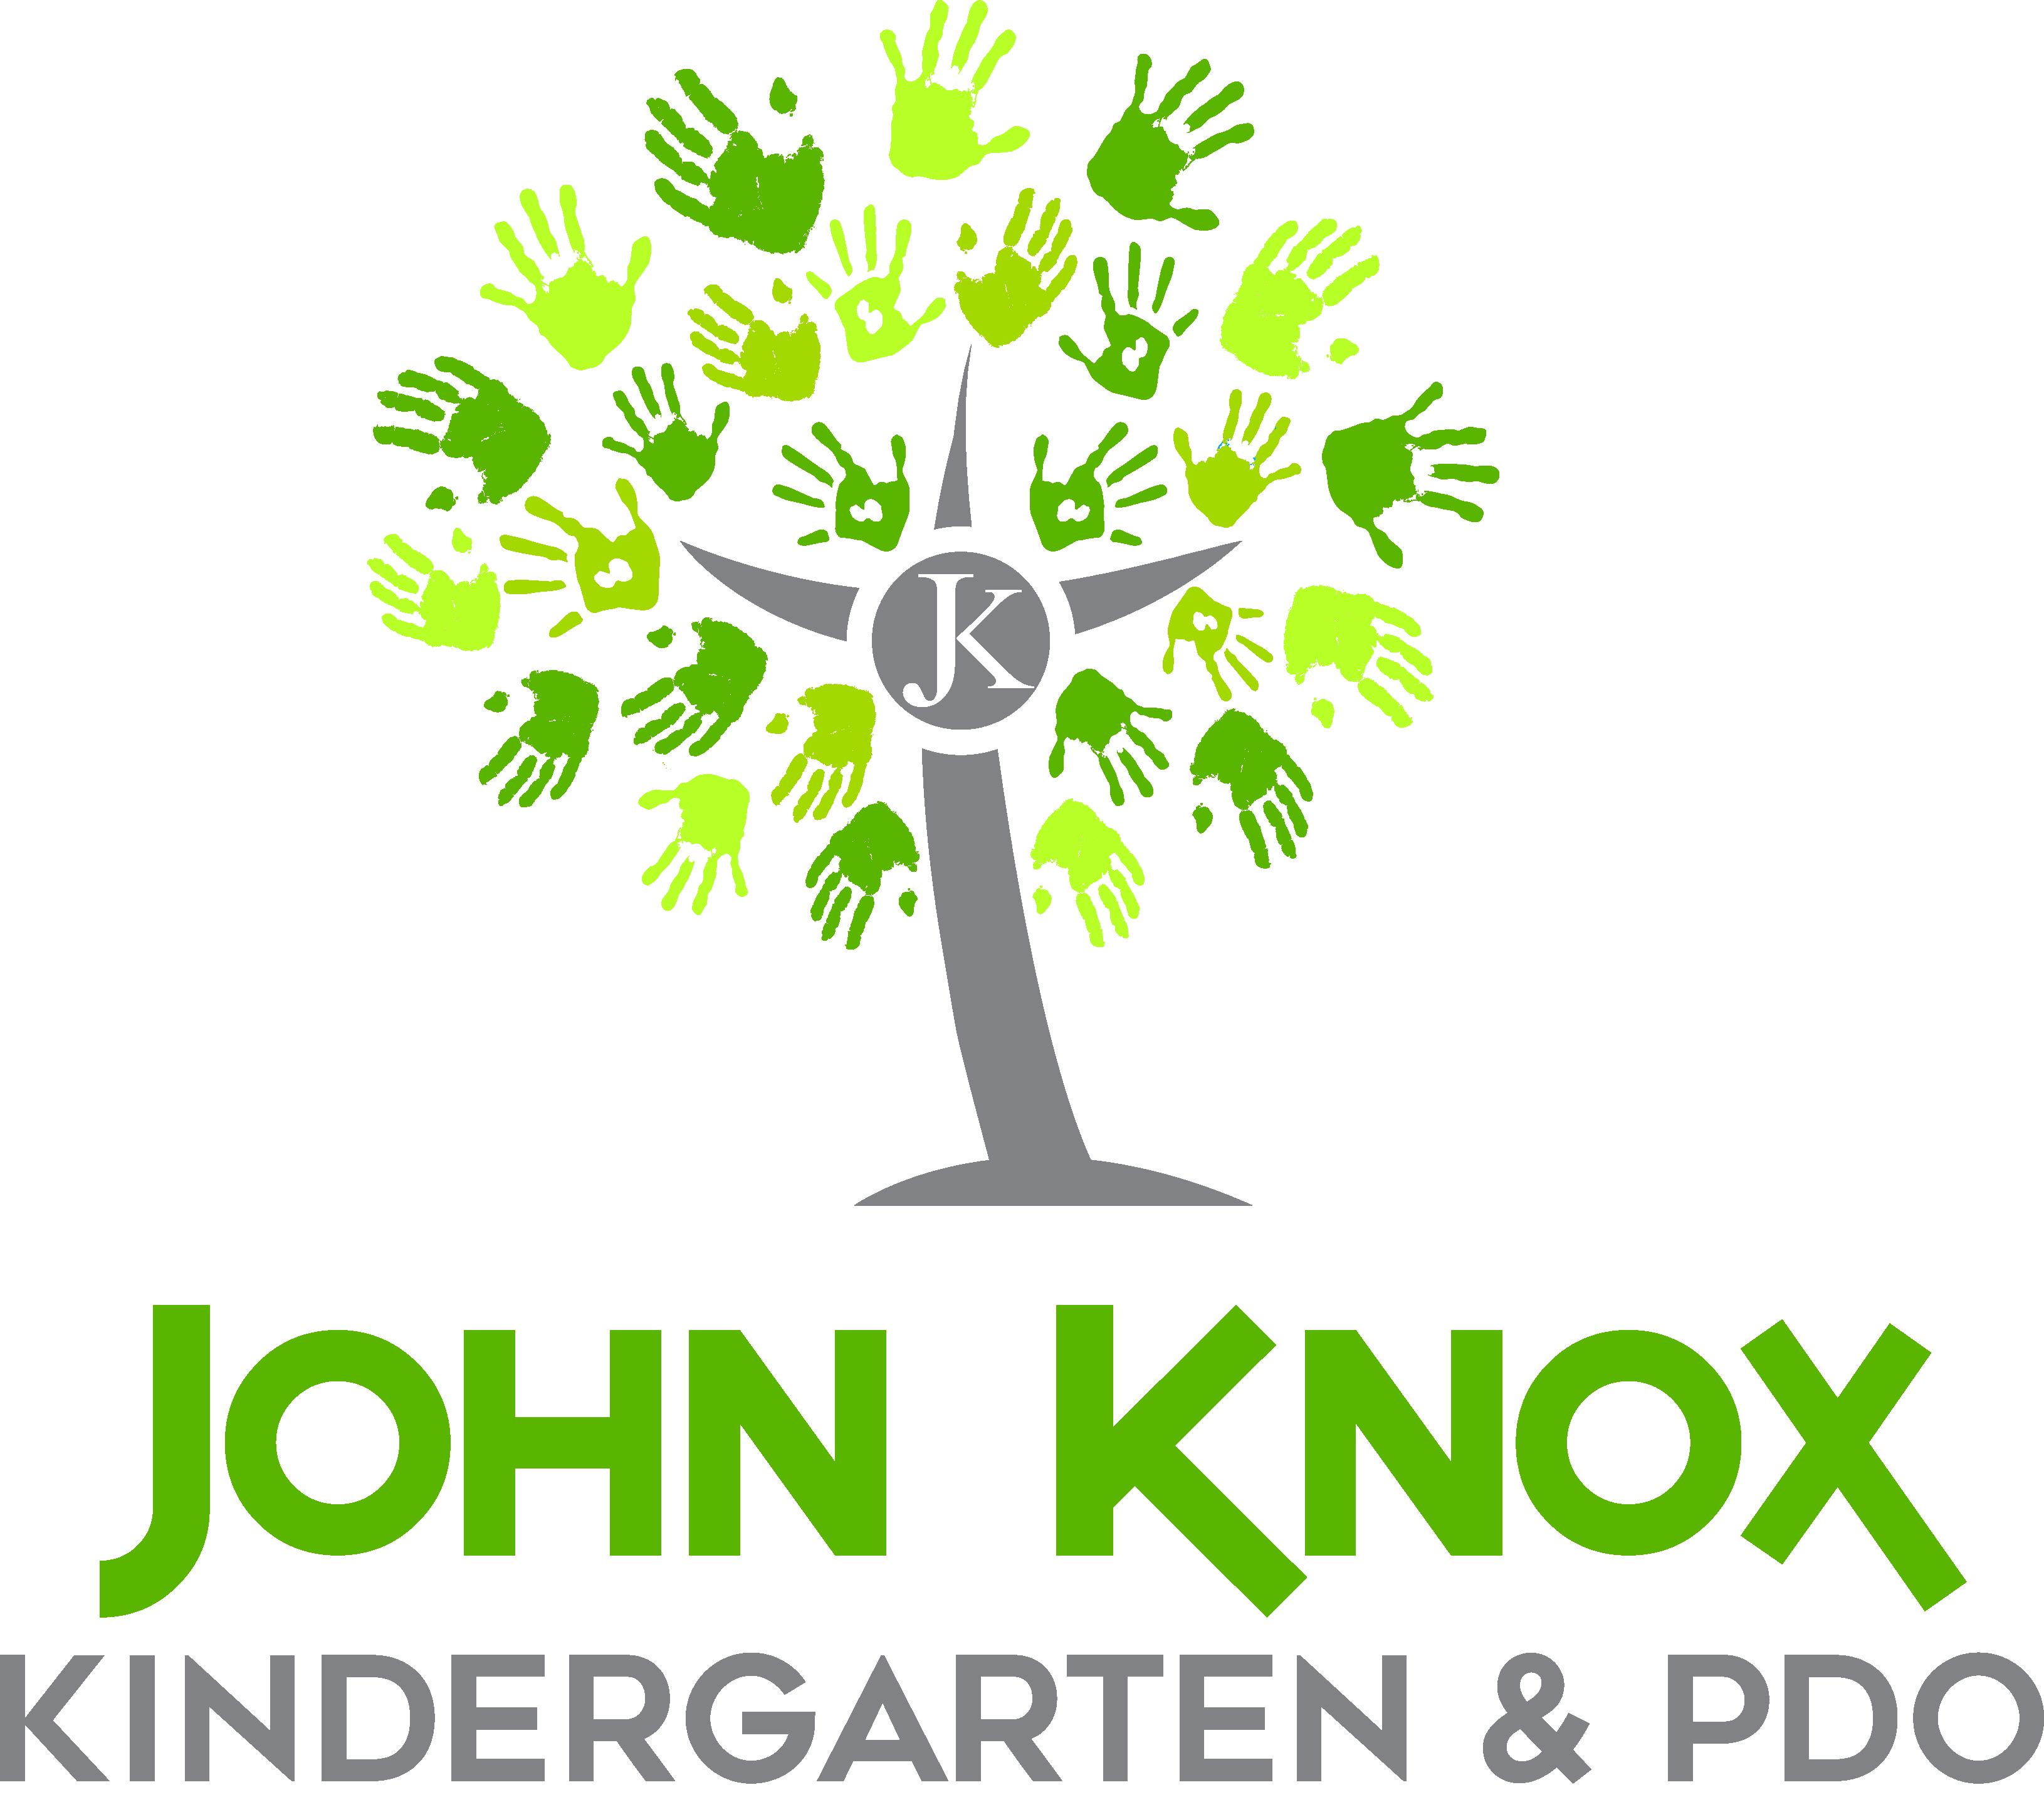 John Knox Kindergarten & Parents' Day Out